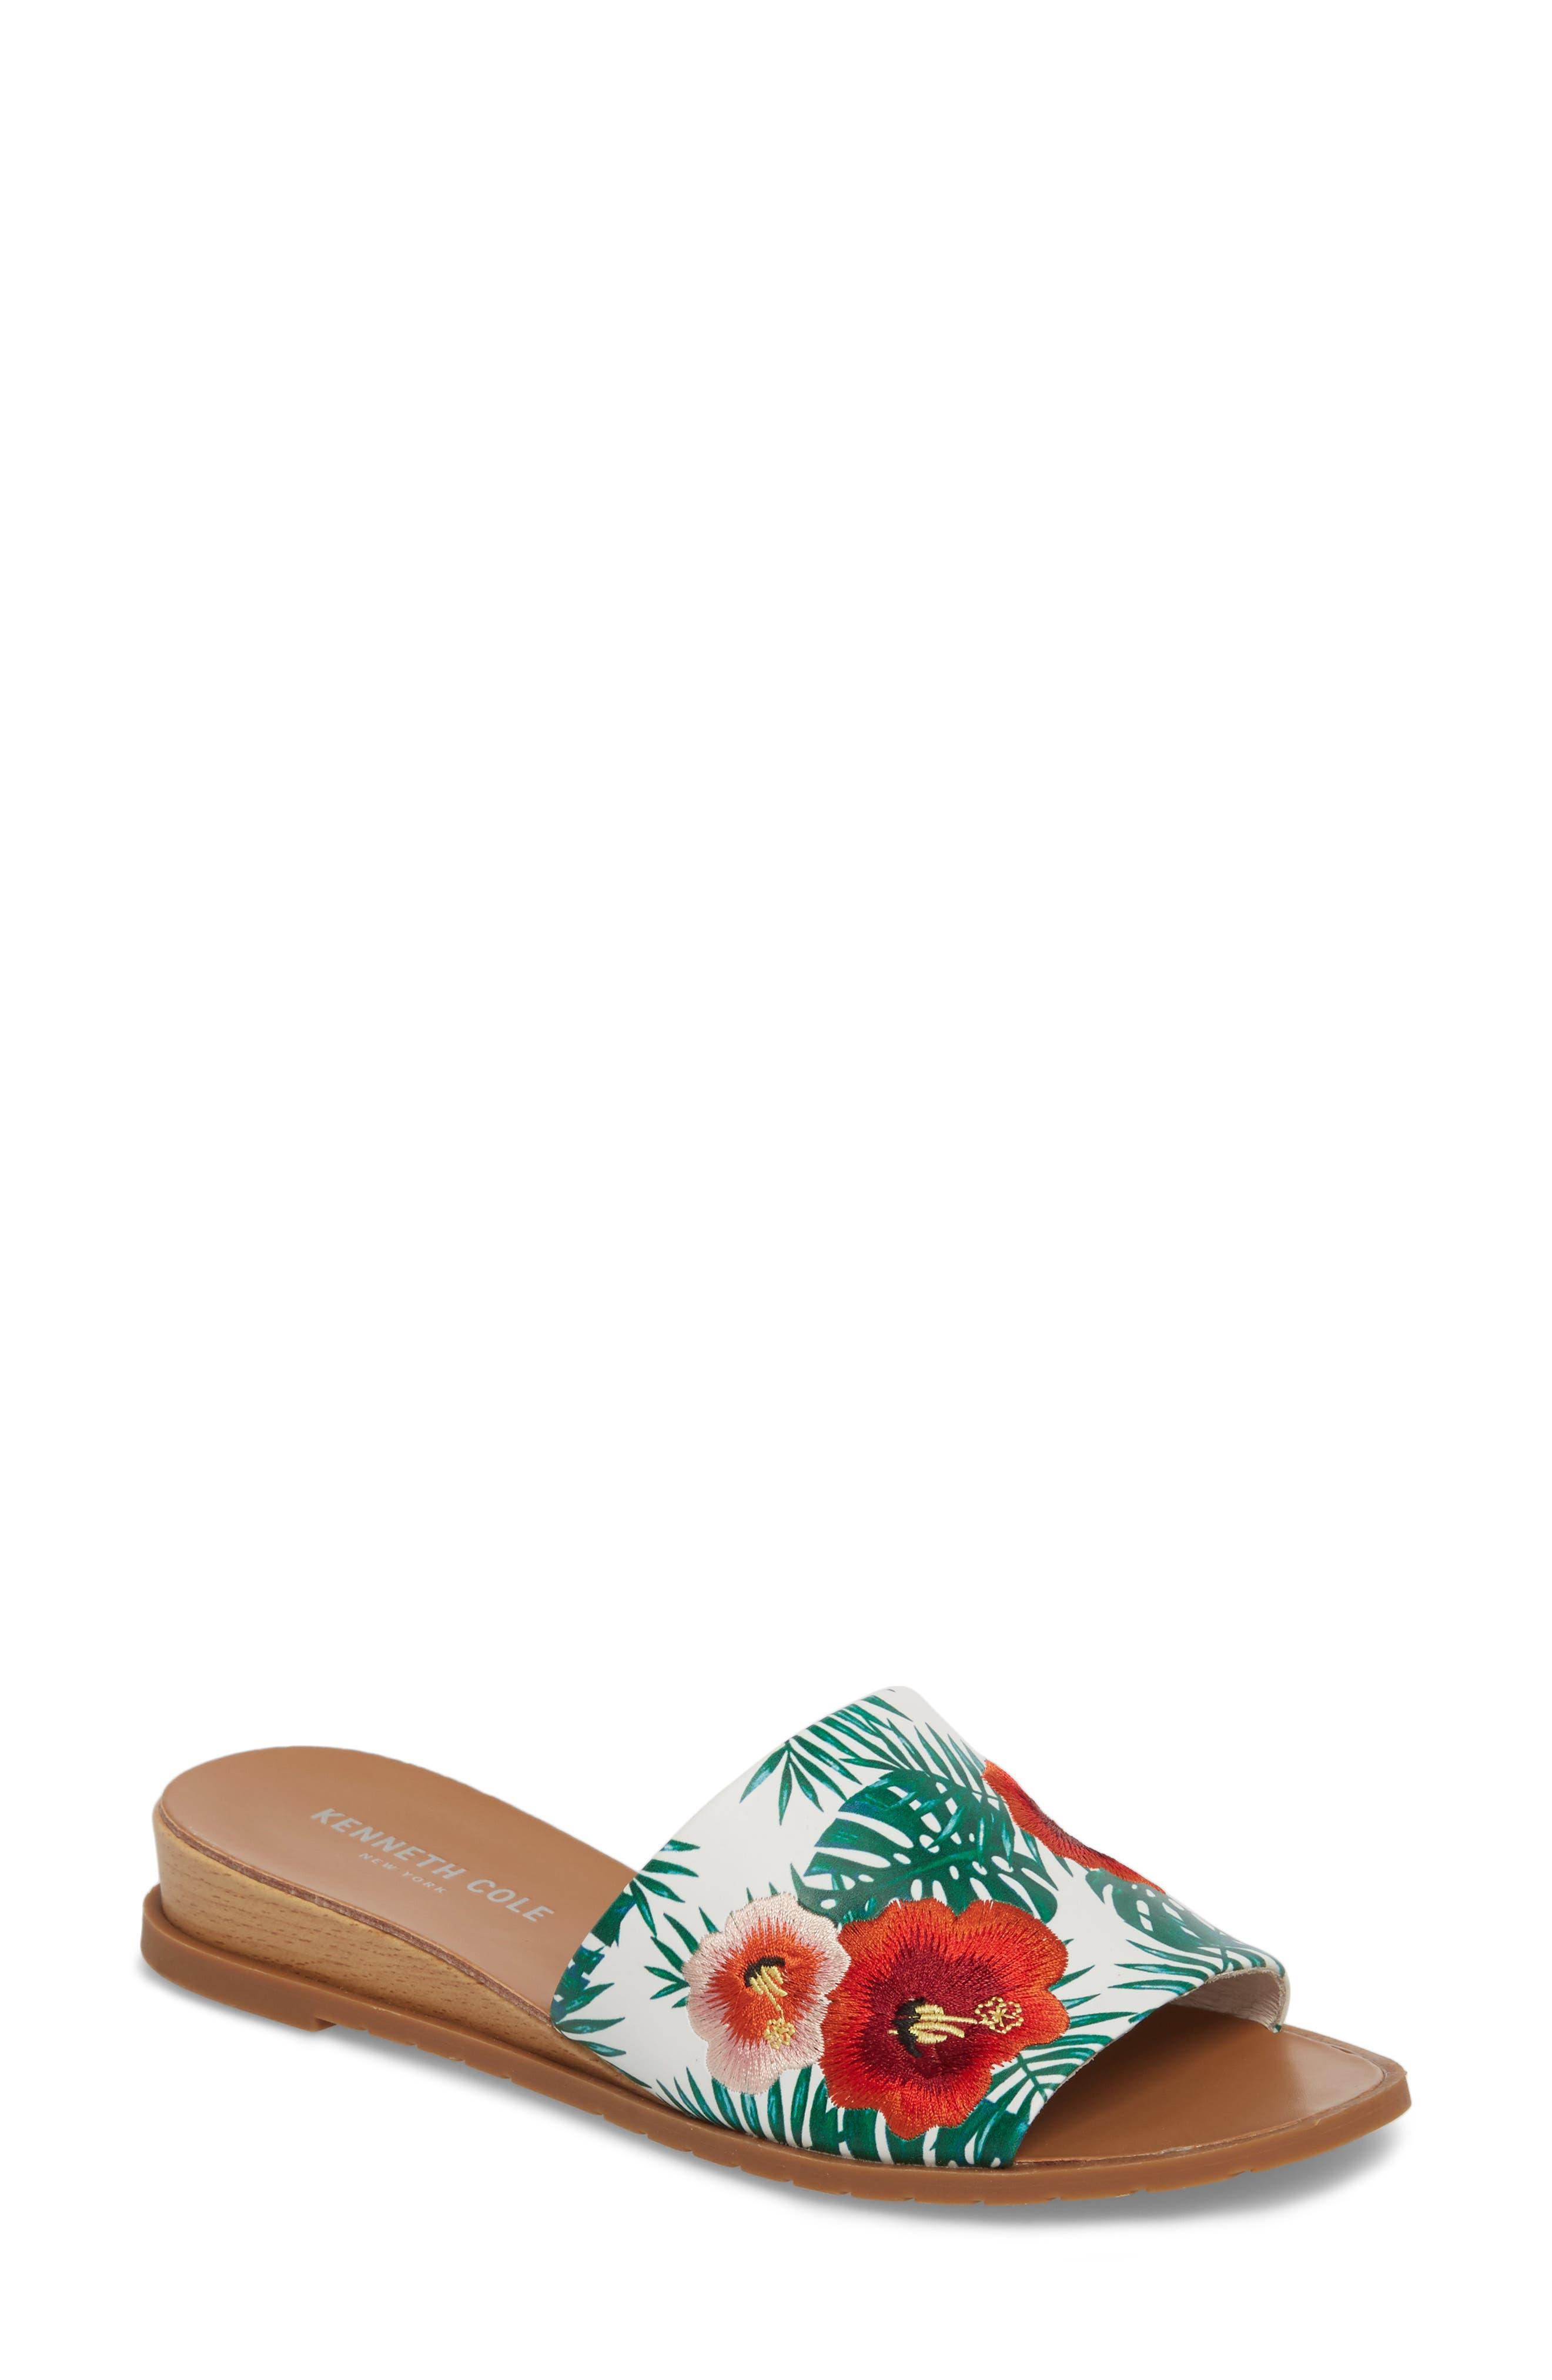 Kenneth Cole New York Joanne Flower Embroidered Slide Sandal (Women)